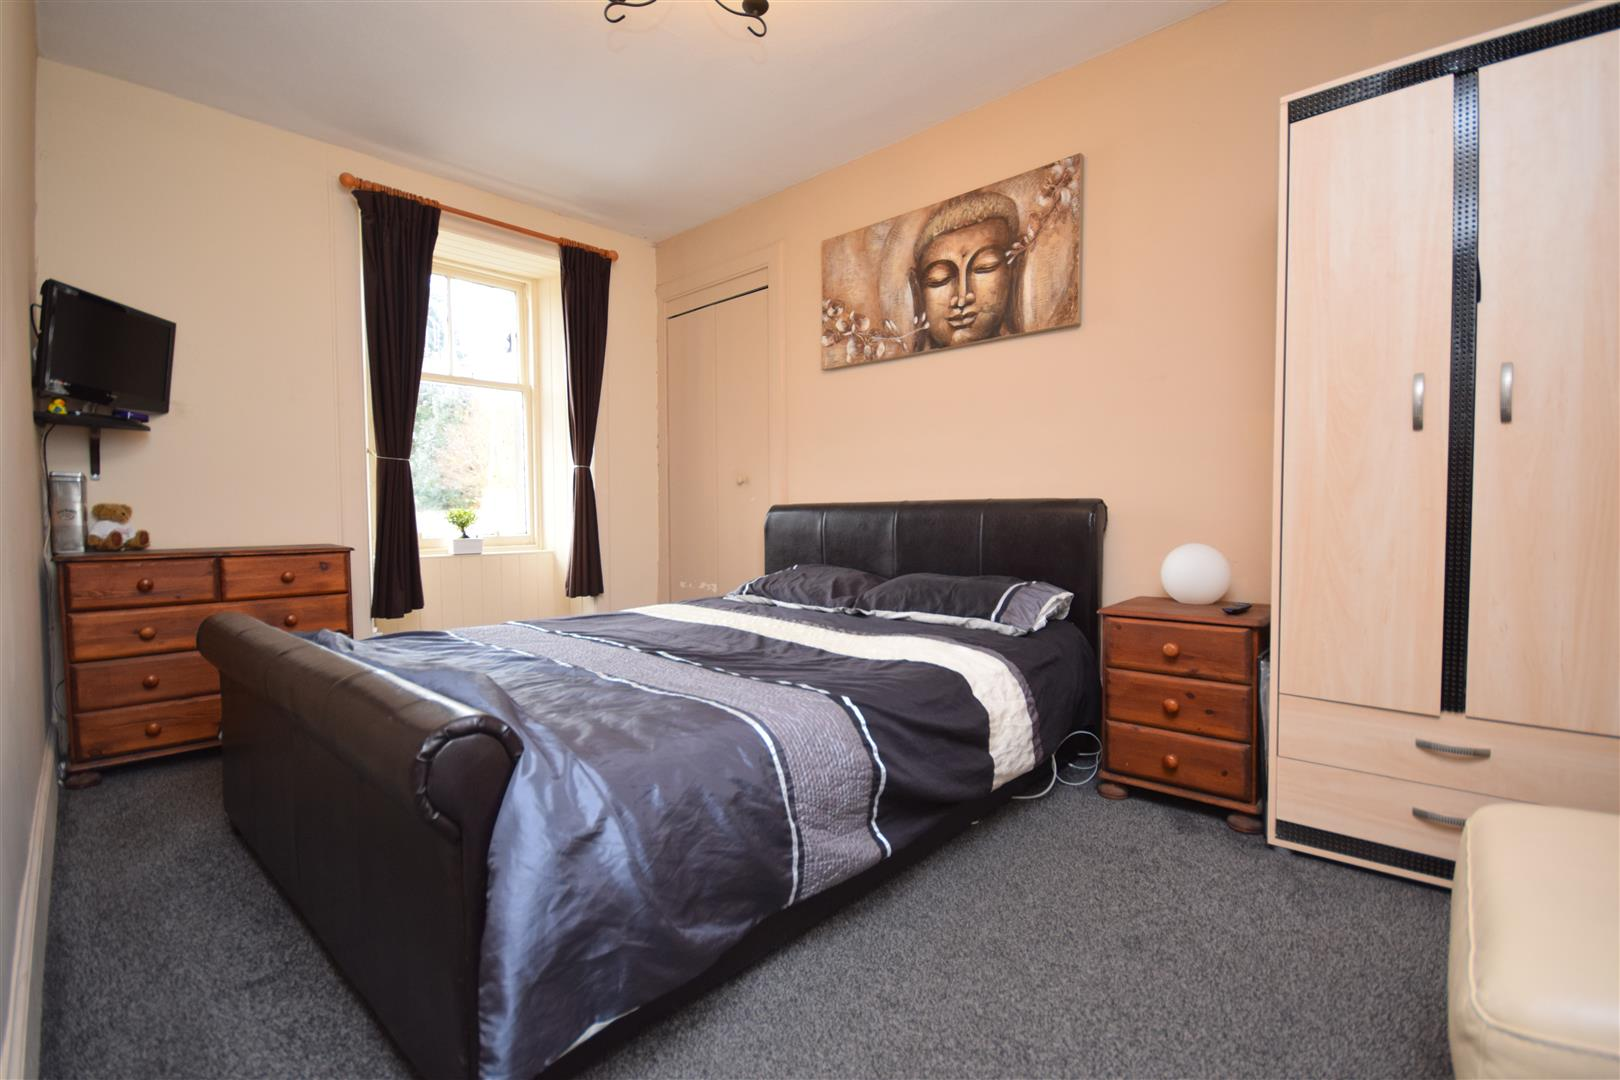 5, Birnam Place, Pitlochry, Perthshire, PH16 5AE, UK